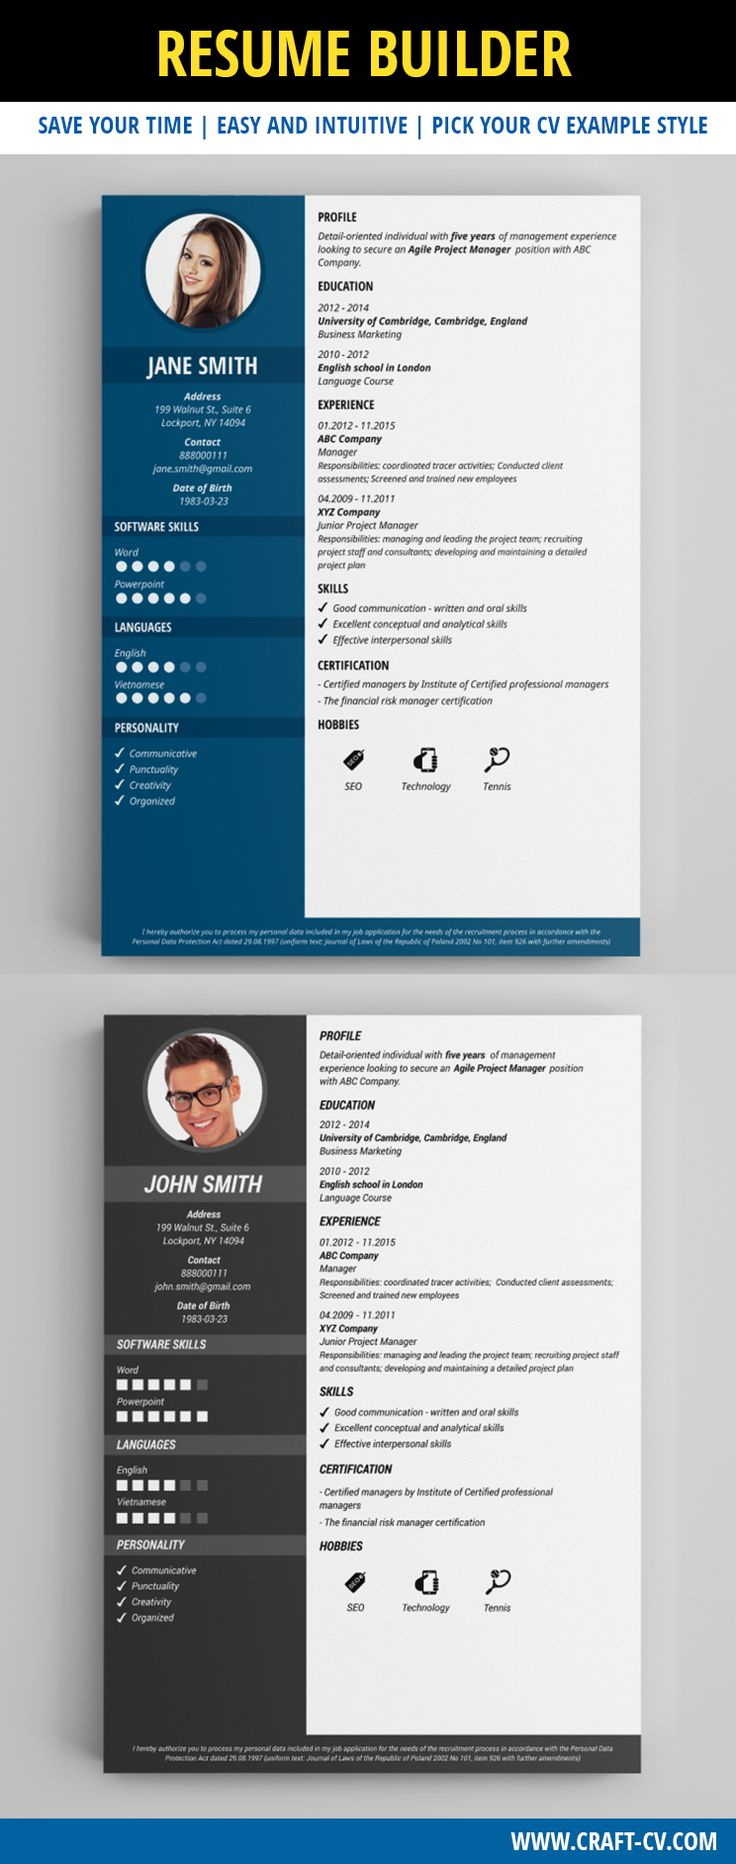 Fresh & Simple CV Sample #simpleresume #cv #classicresume